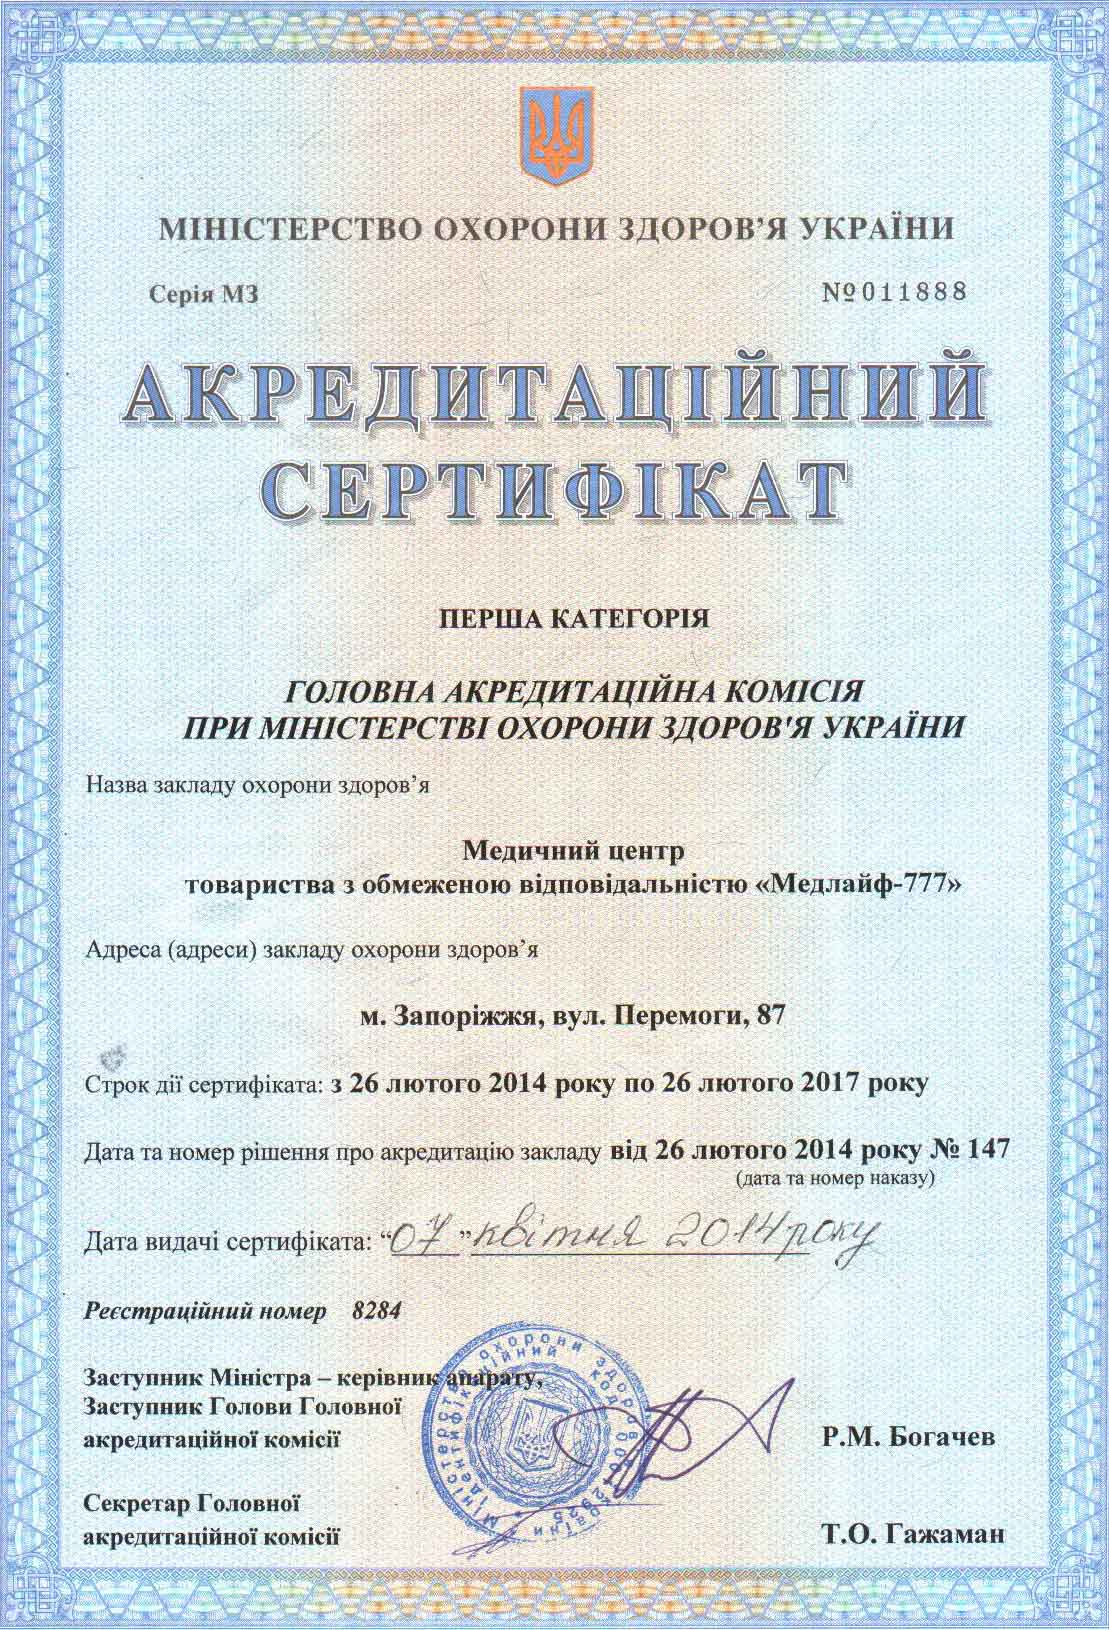 Аккредитация Медлайф777 1 категория